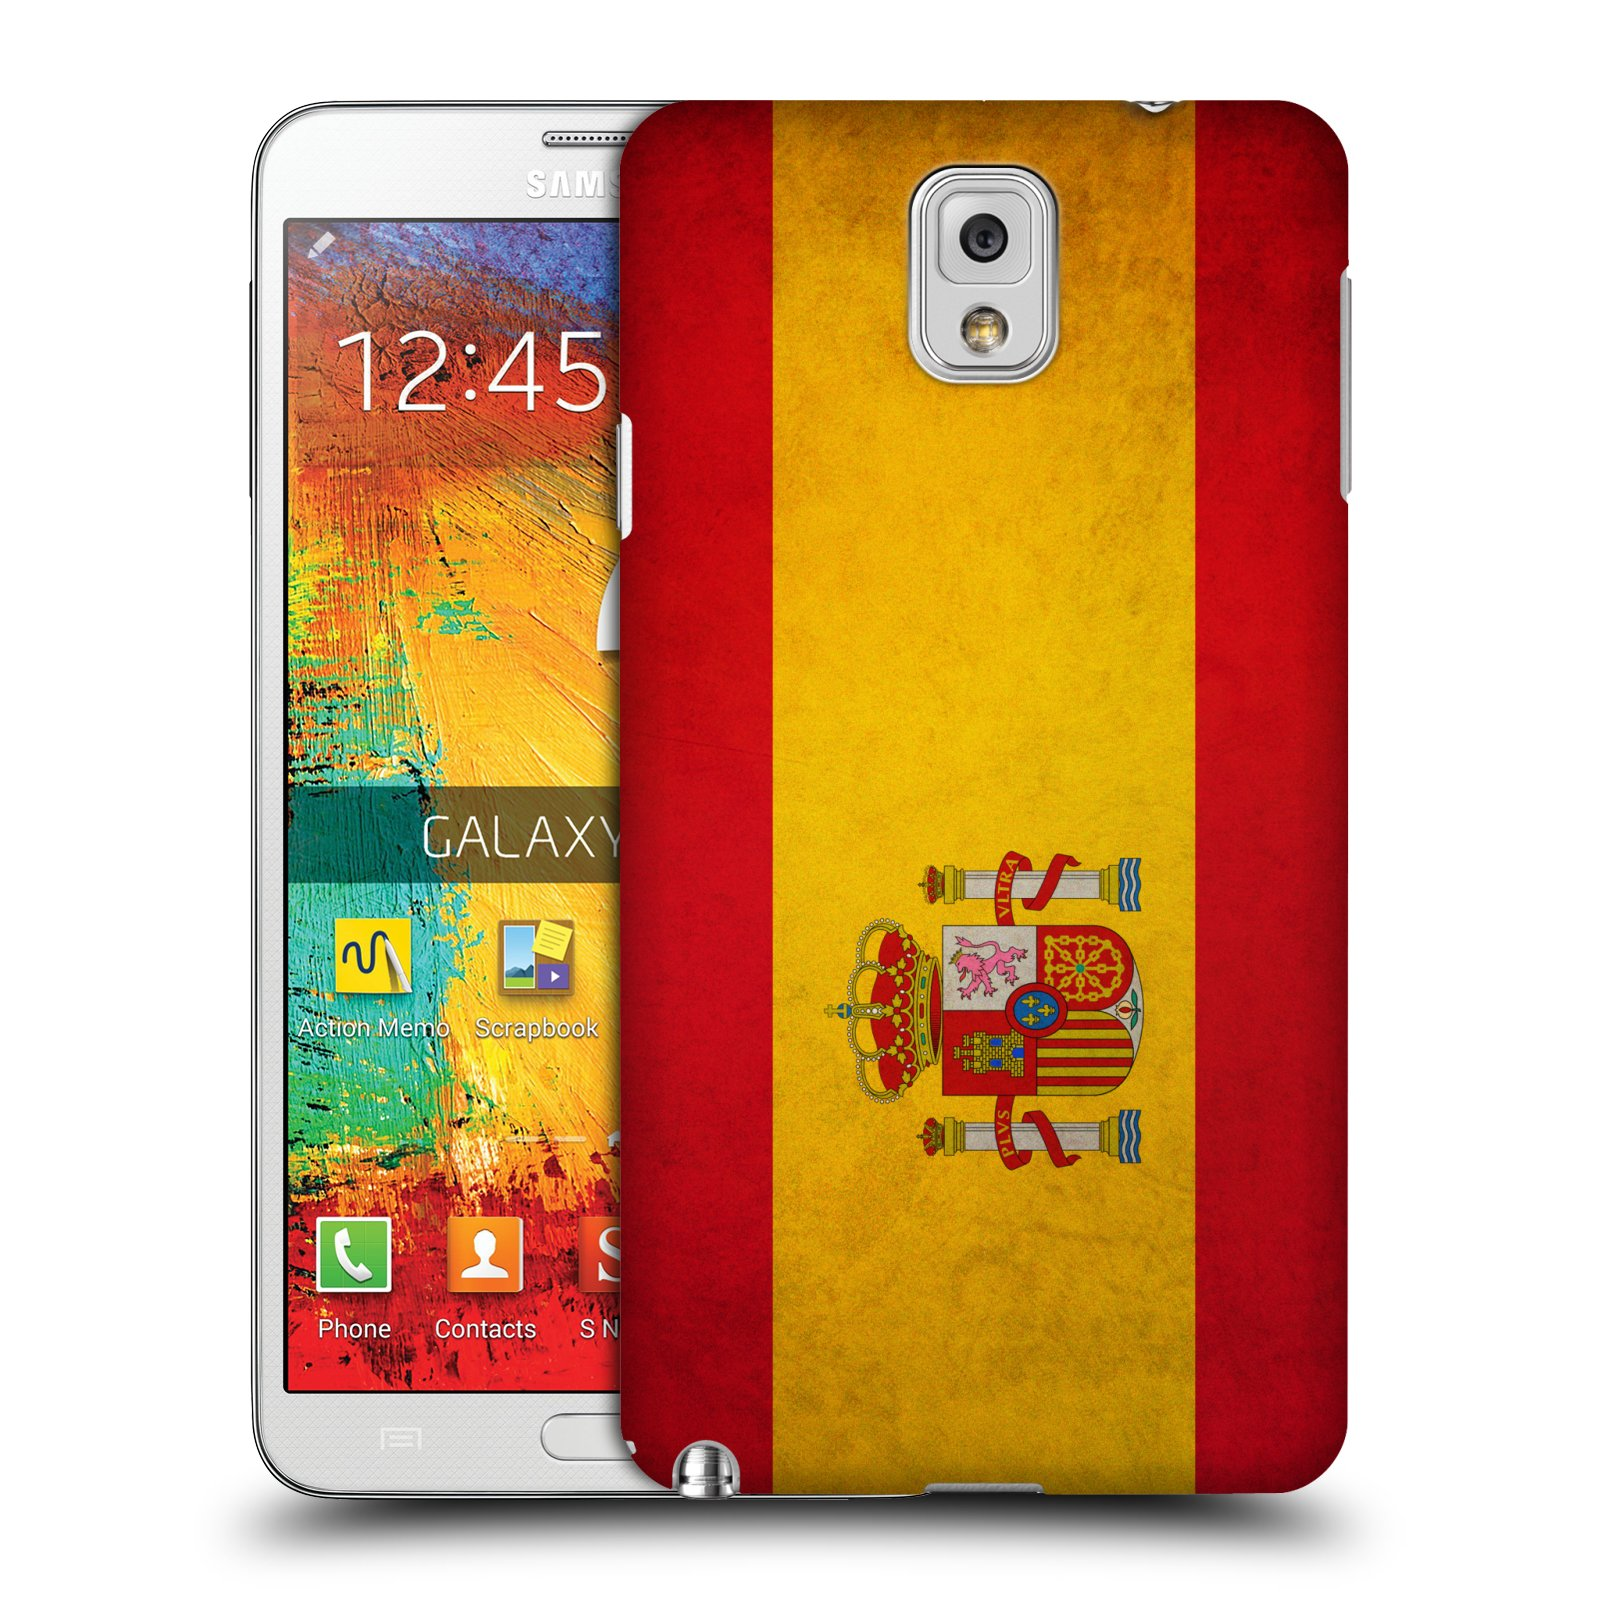 Plastové pouzdro na mobil Samsung Galaxy Note 3 HEAD CASE VLAJKA ŠPANĚLSKO (Kryt či obal na mobilní telefon Samsung Galaxy Note 3 SM-N9005)